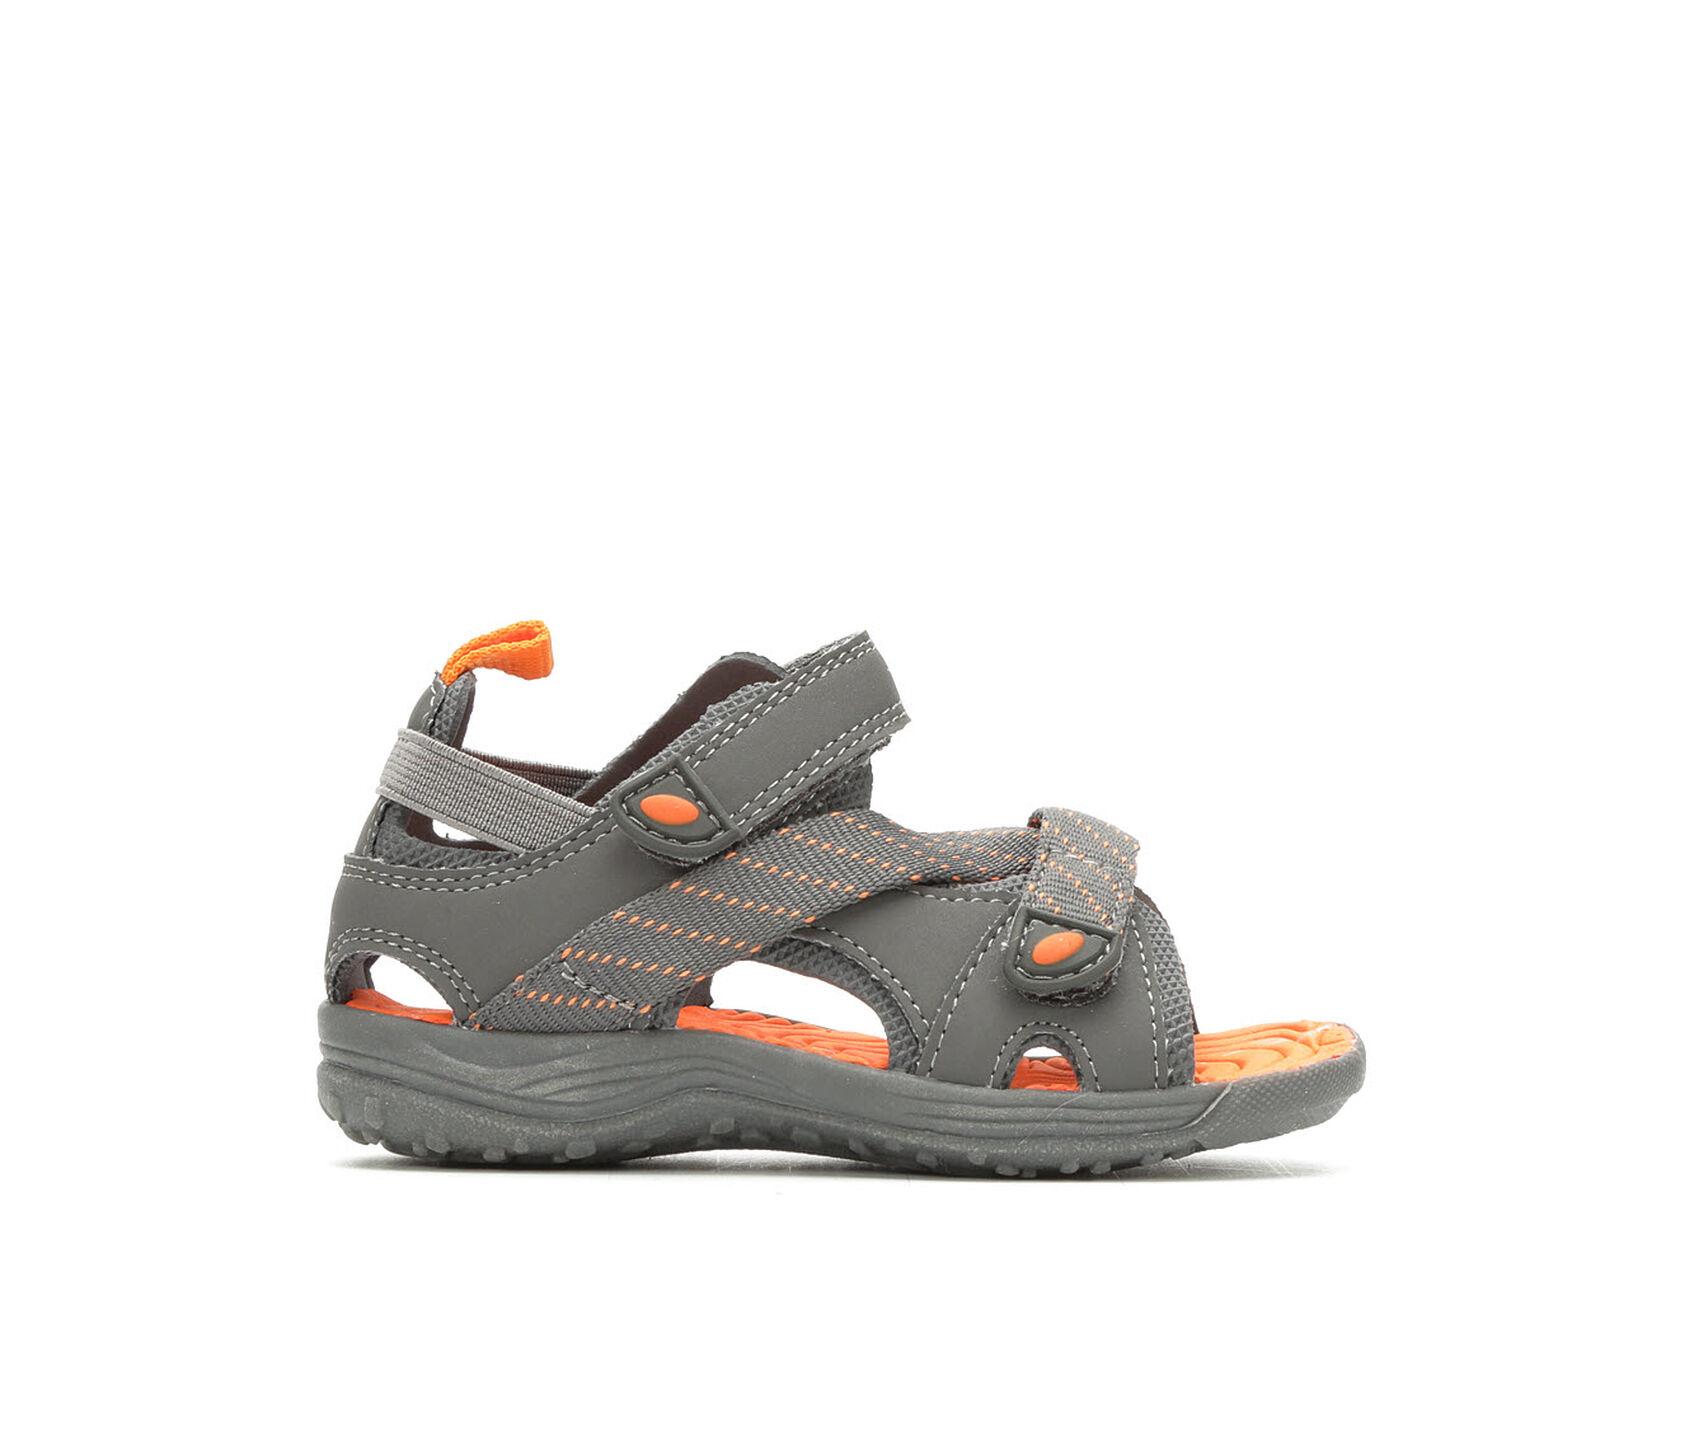 85a6ba5fae1f Boys' Beaver Creek Toddler Kayak Outdoor Sandals | Shoe Carnival